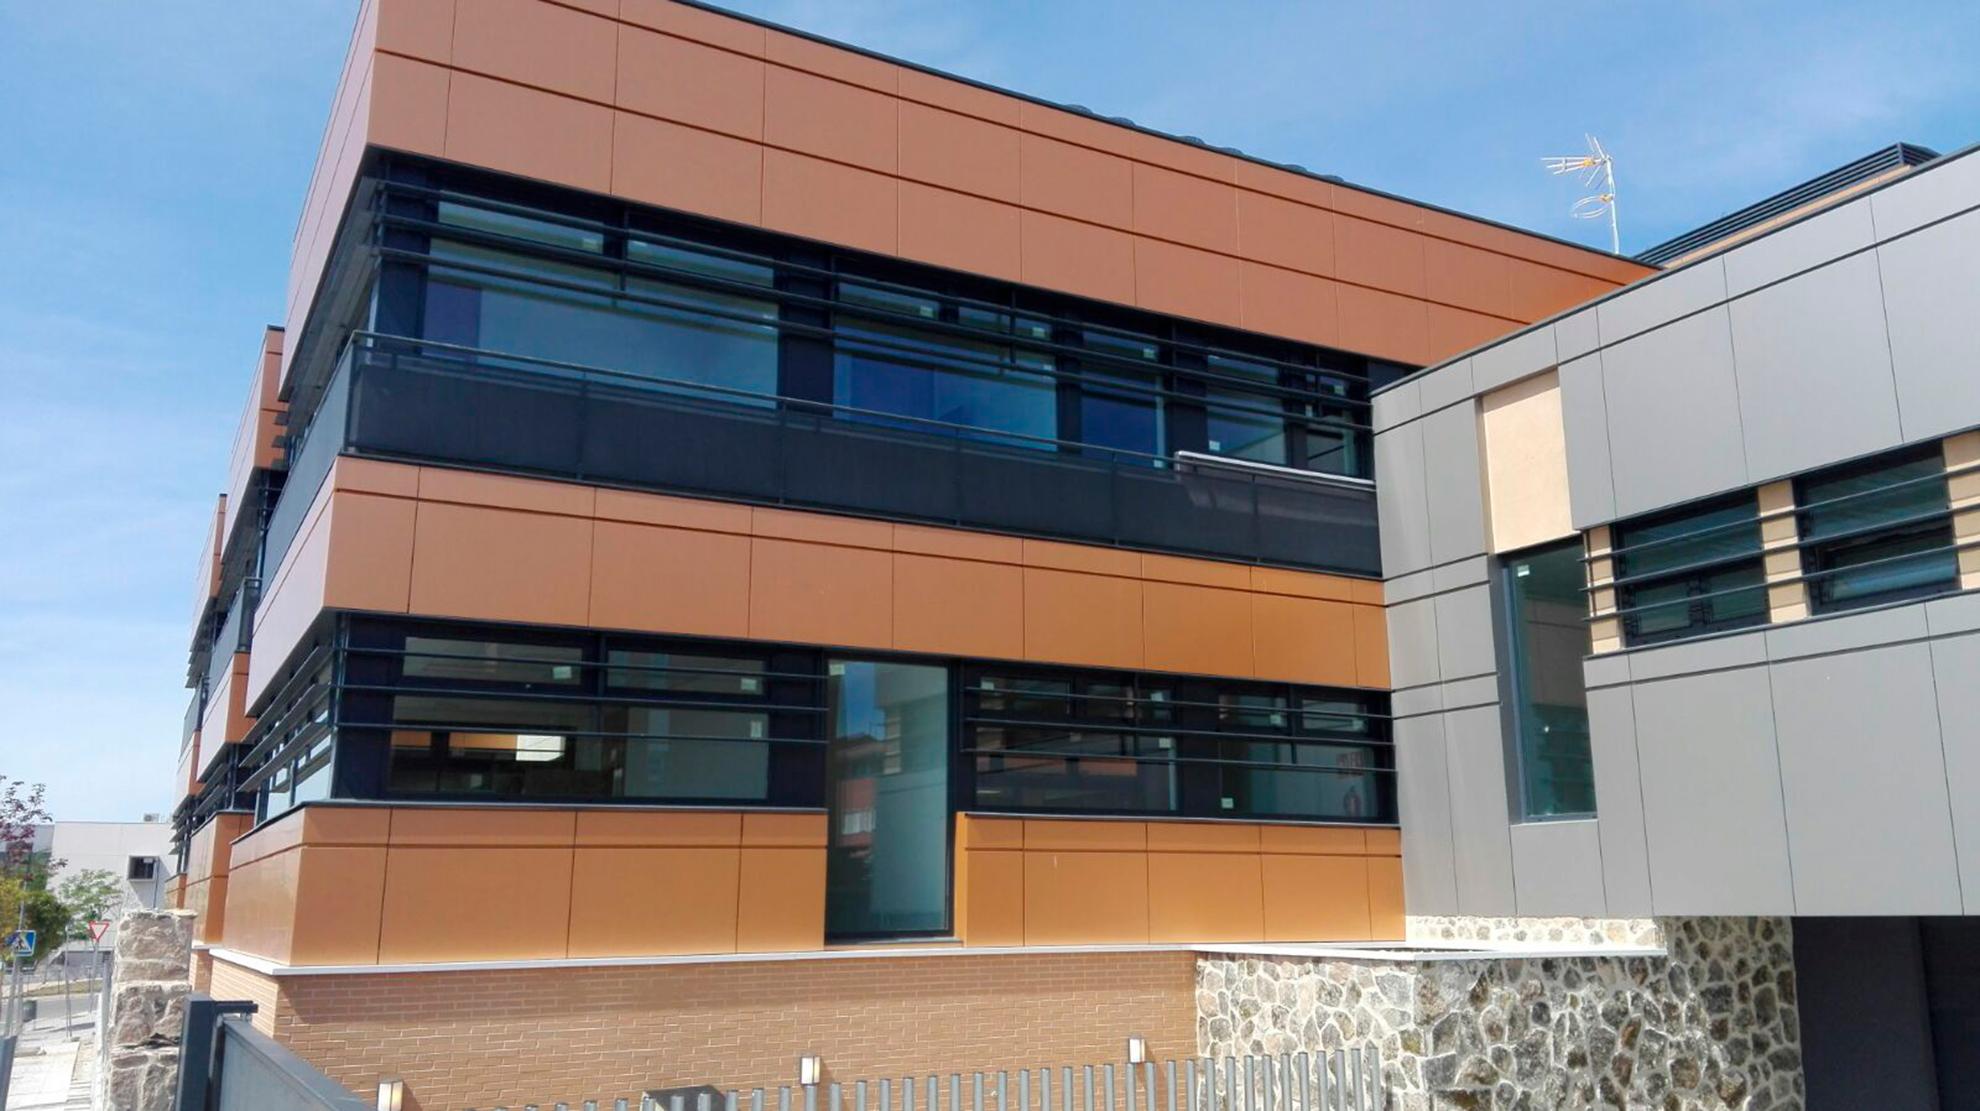 Edificio-Municipal-Multidisciplinar-de-Miramadrid-2_1585901606.jpg